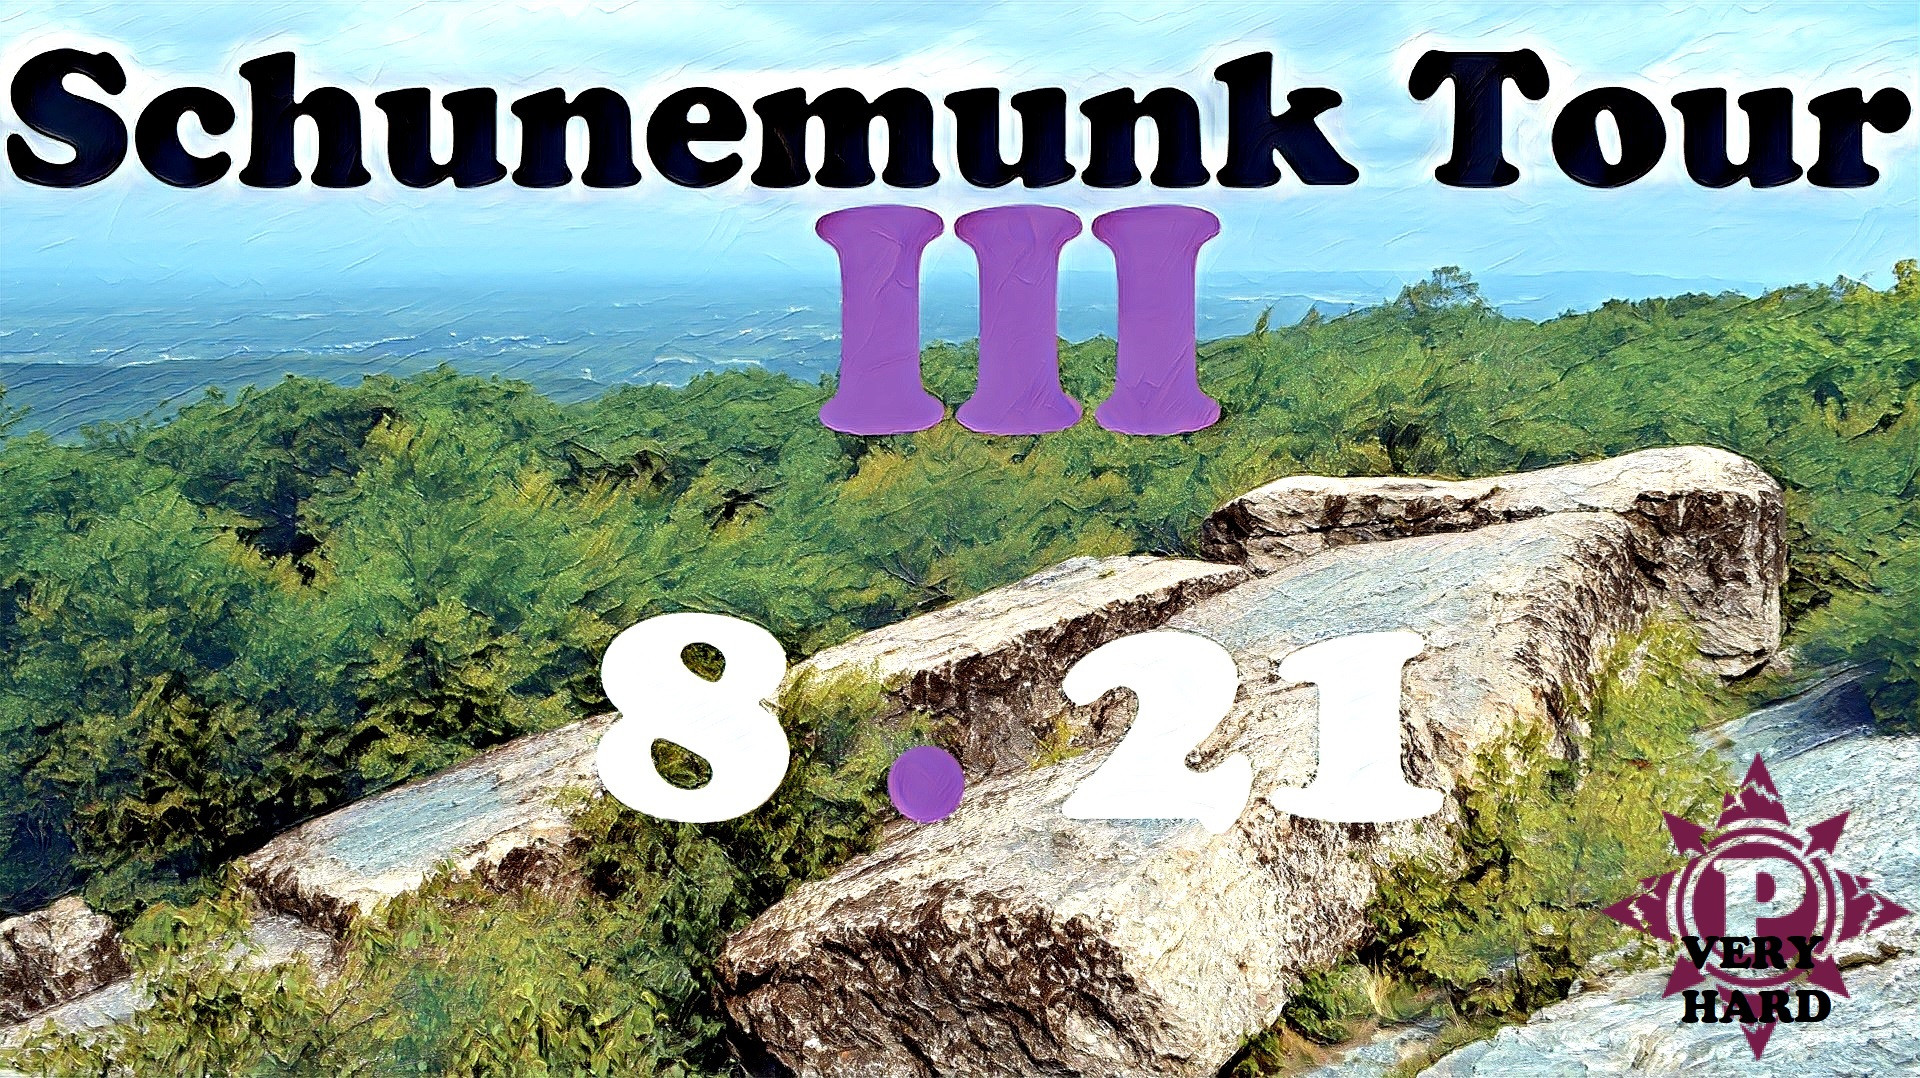 8.21 - Schunemunk Tour III